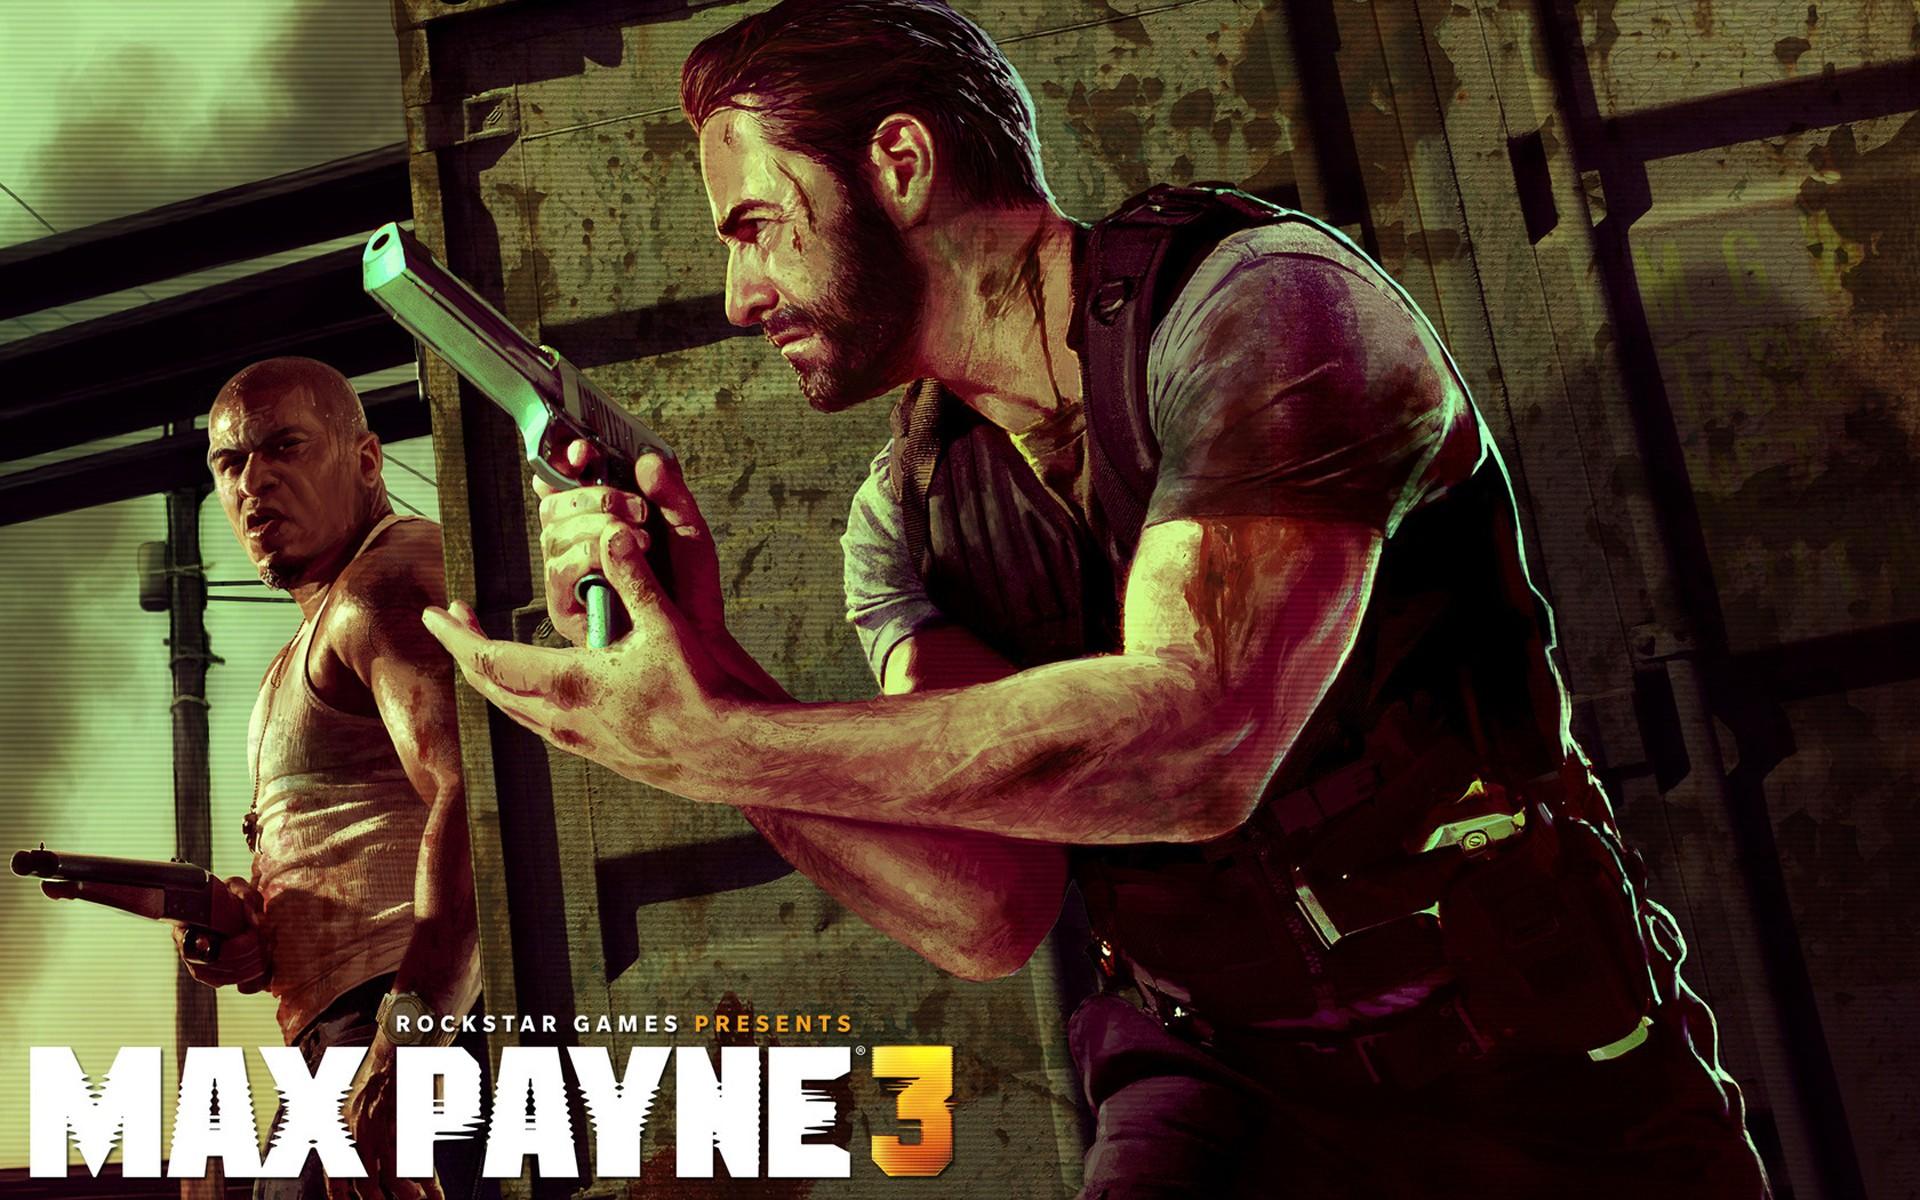 Wonderful Wallpaper Movie Max Payne - music-guitarist-Max-Payne-screenshot-action-film-172428  Perfect Image Reference_713621.jpg